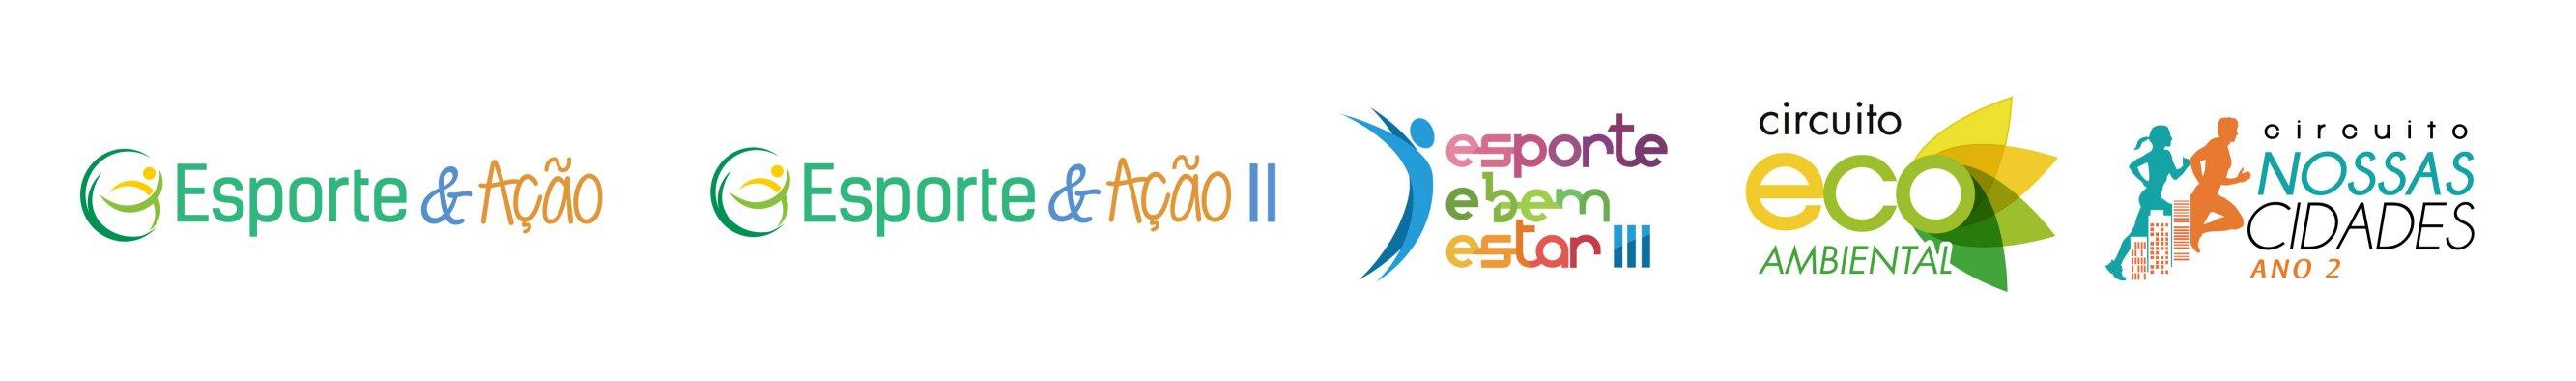 Logos Site-1